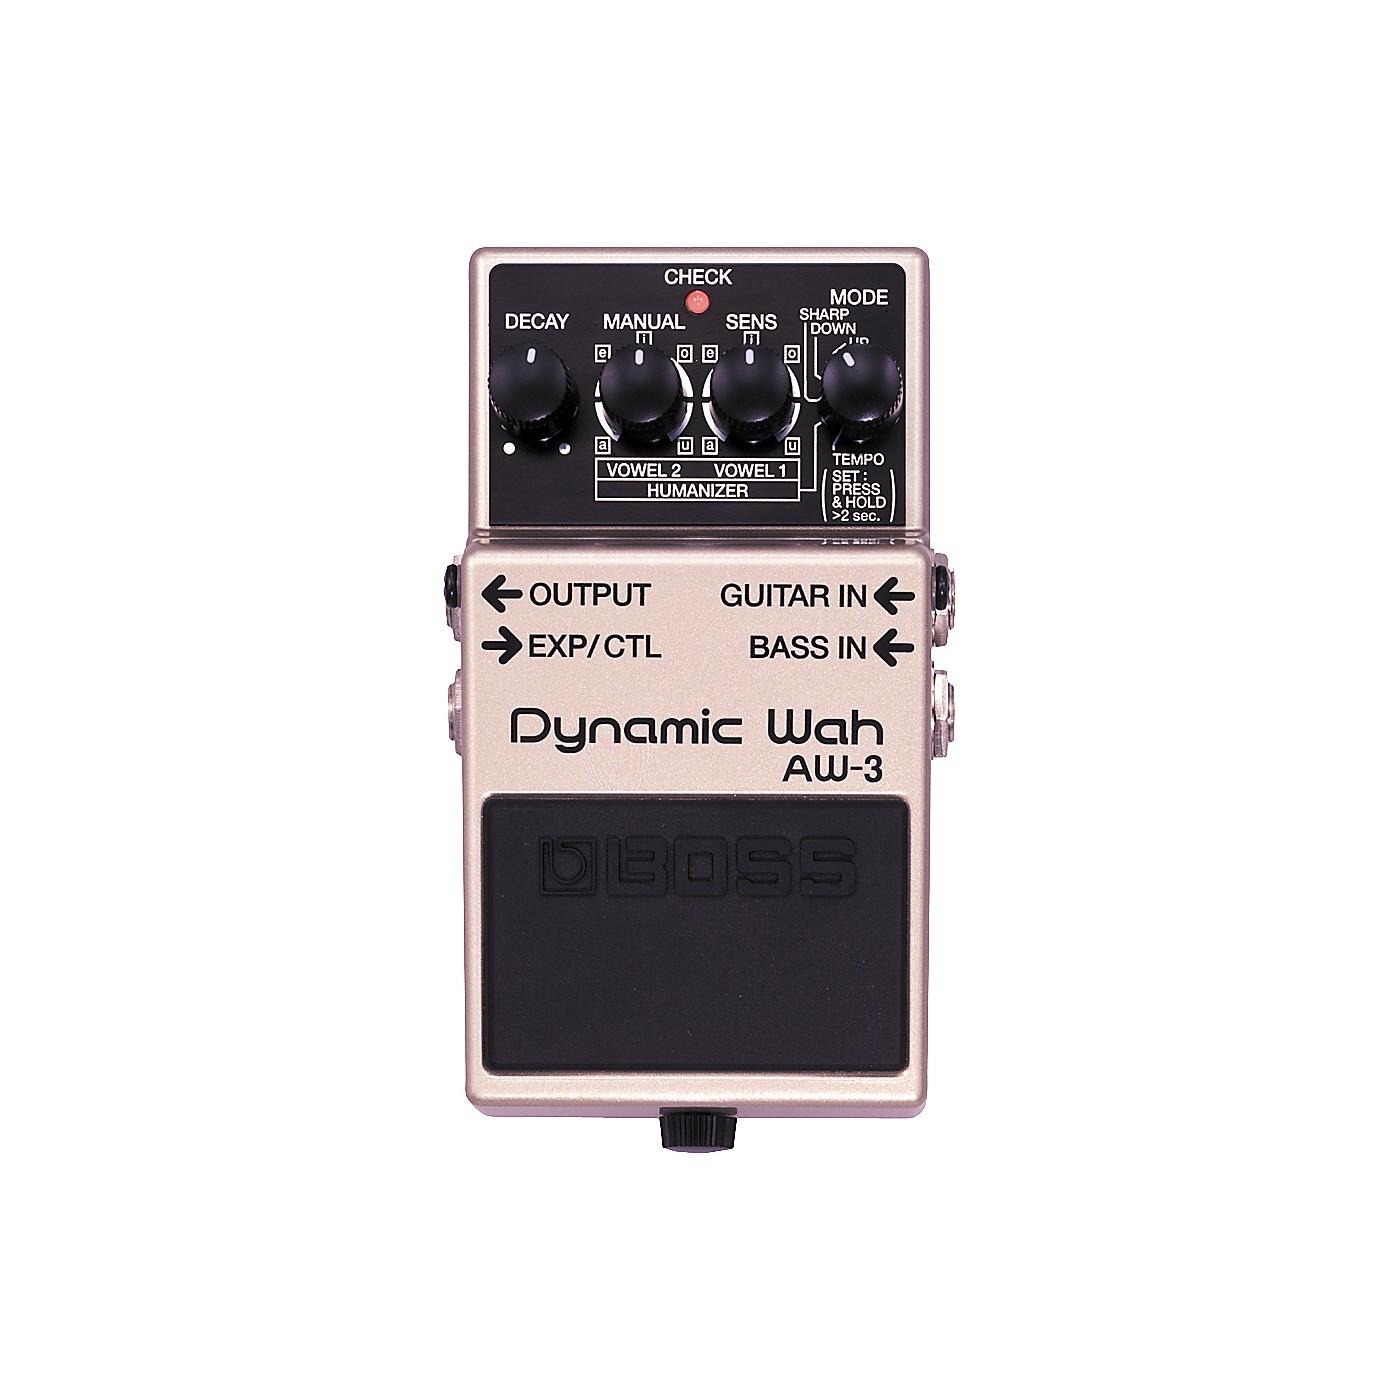 BOSS AW-3 Dynamic Wah Guitar Effects Pedal thumbnail